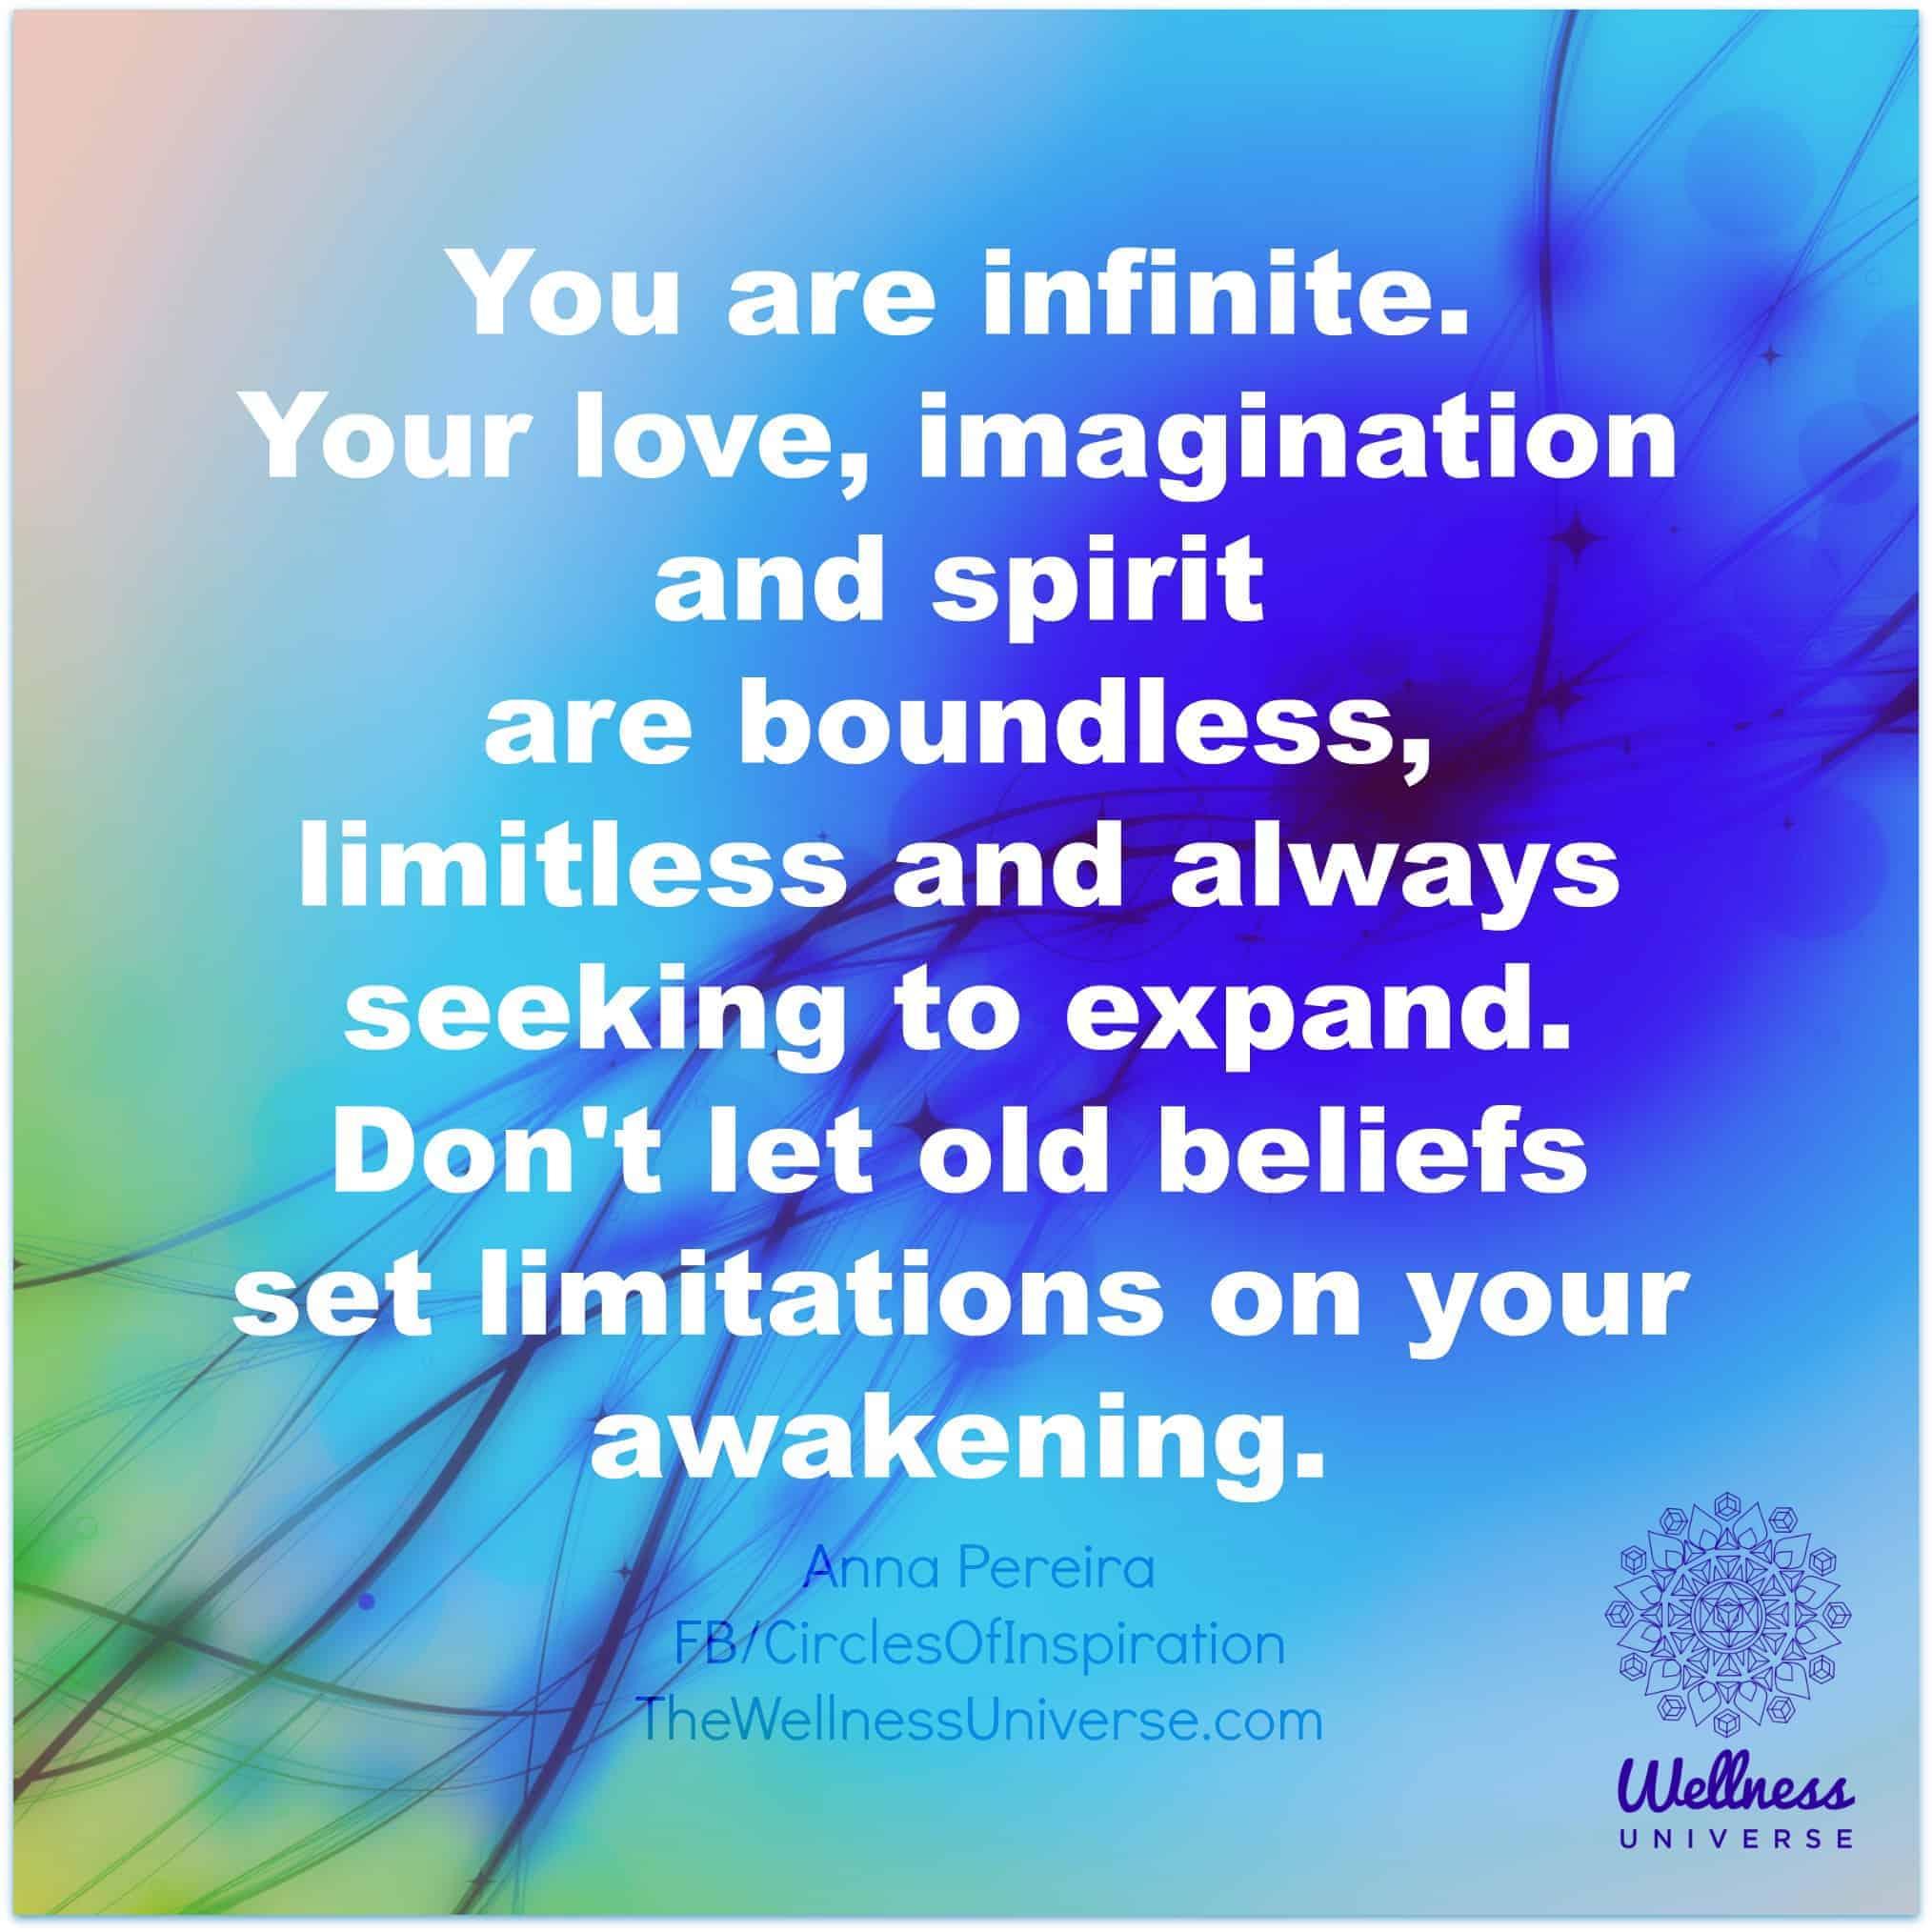 You are limitless. anna pereira 2353